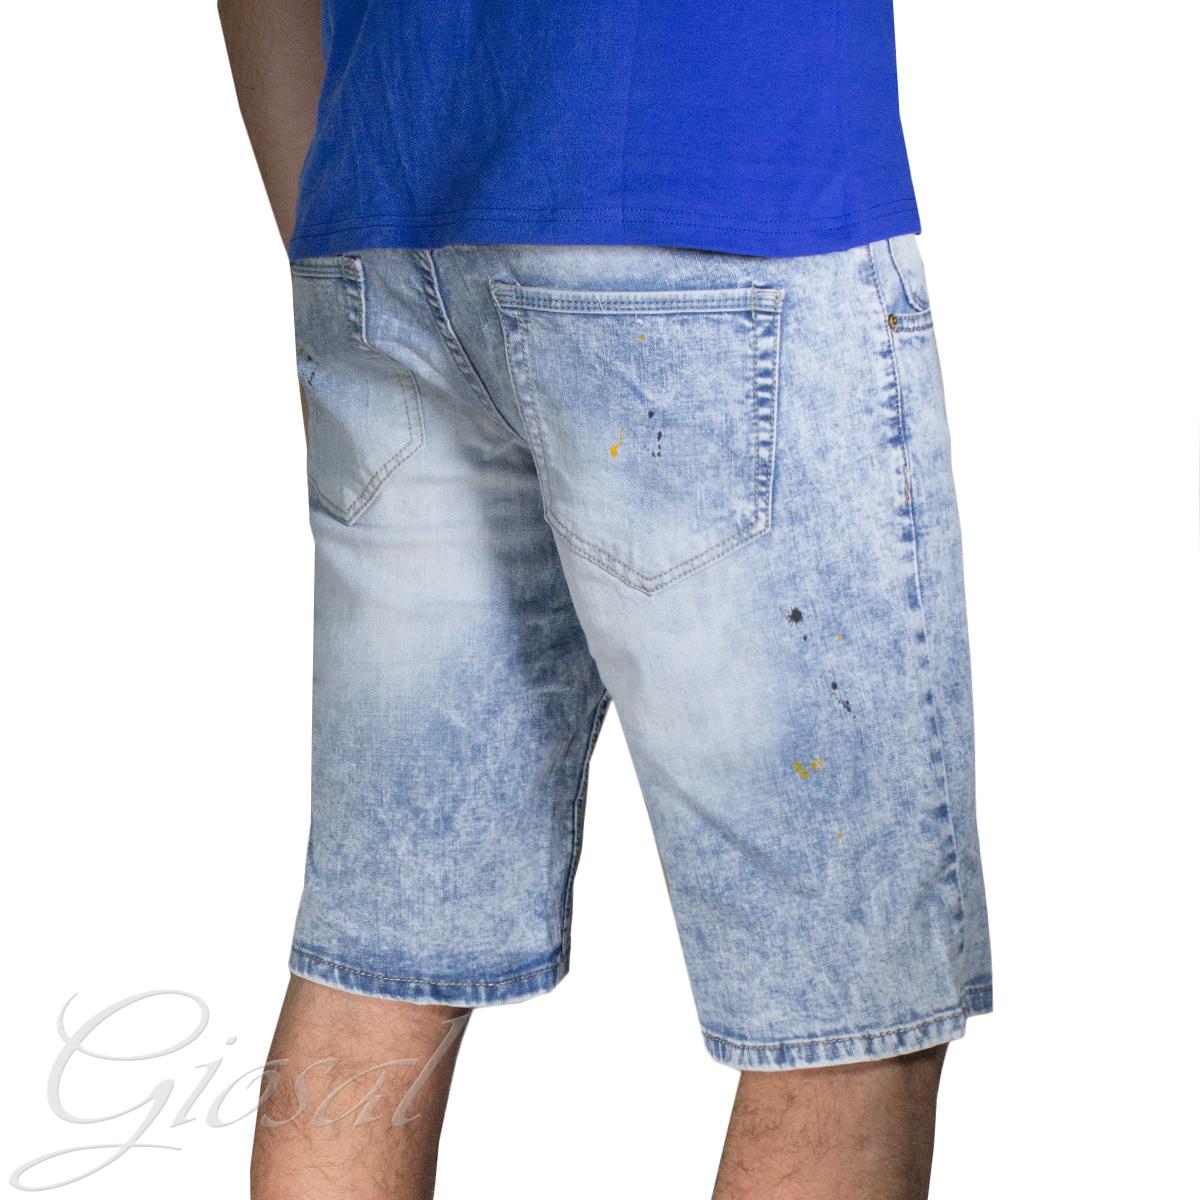 Pantalone-Uomo-Corto-Bermuda-Denim-Jeans-Macchie-Di-Pitture-Cinque-Tasche-GIOSAL miniatura 5